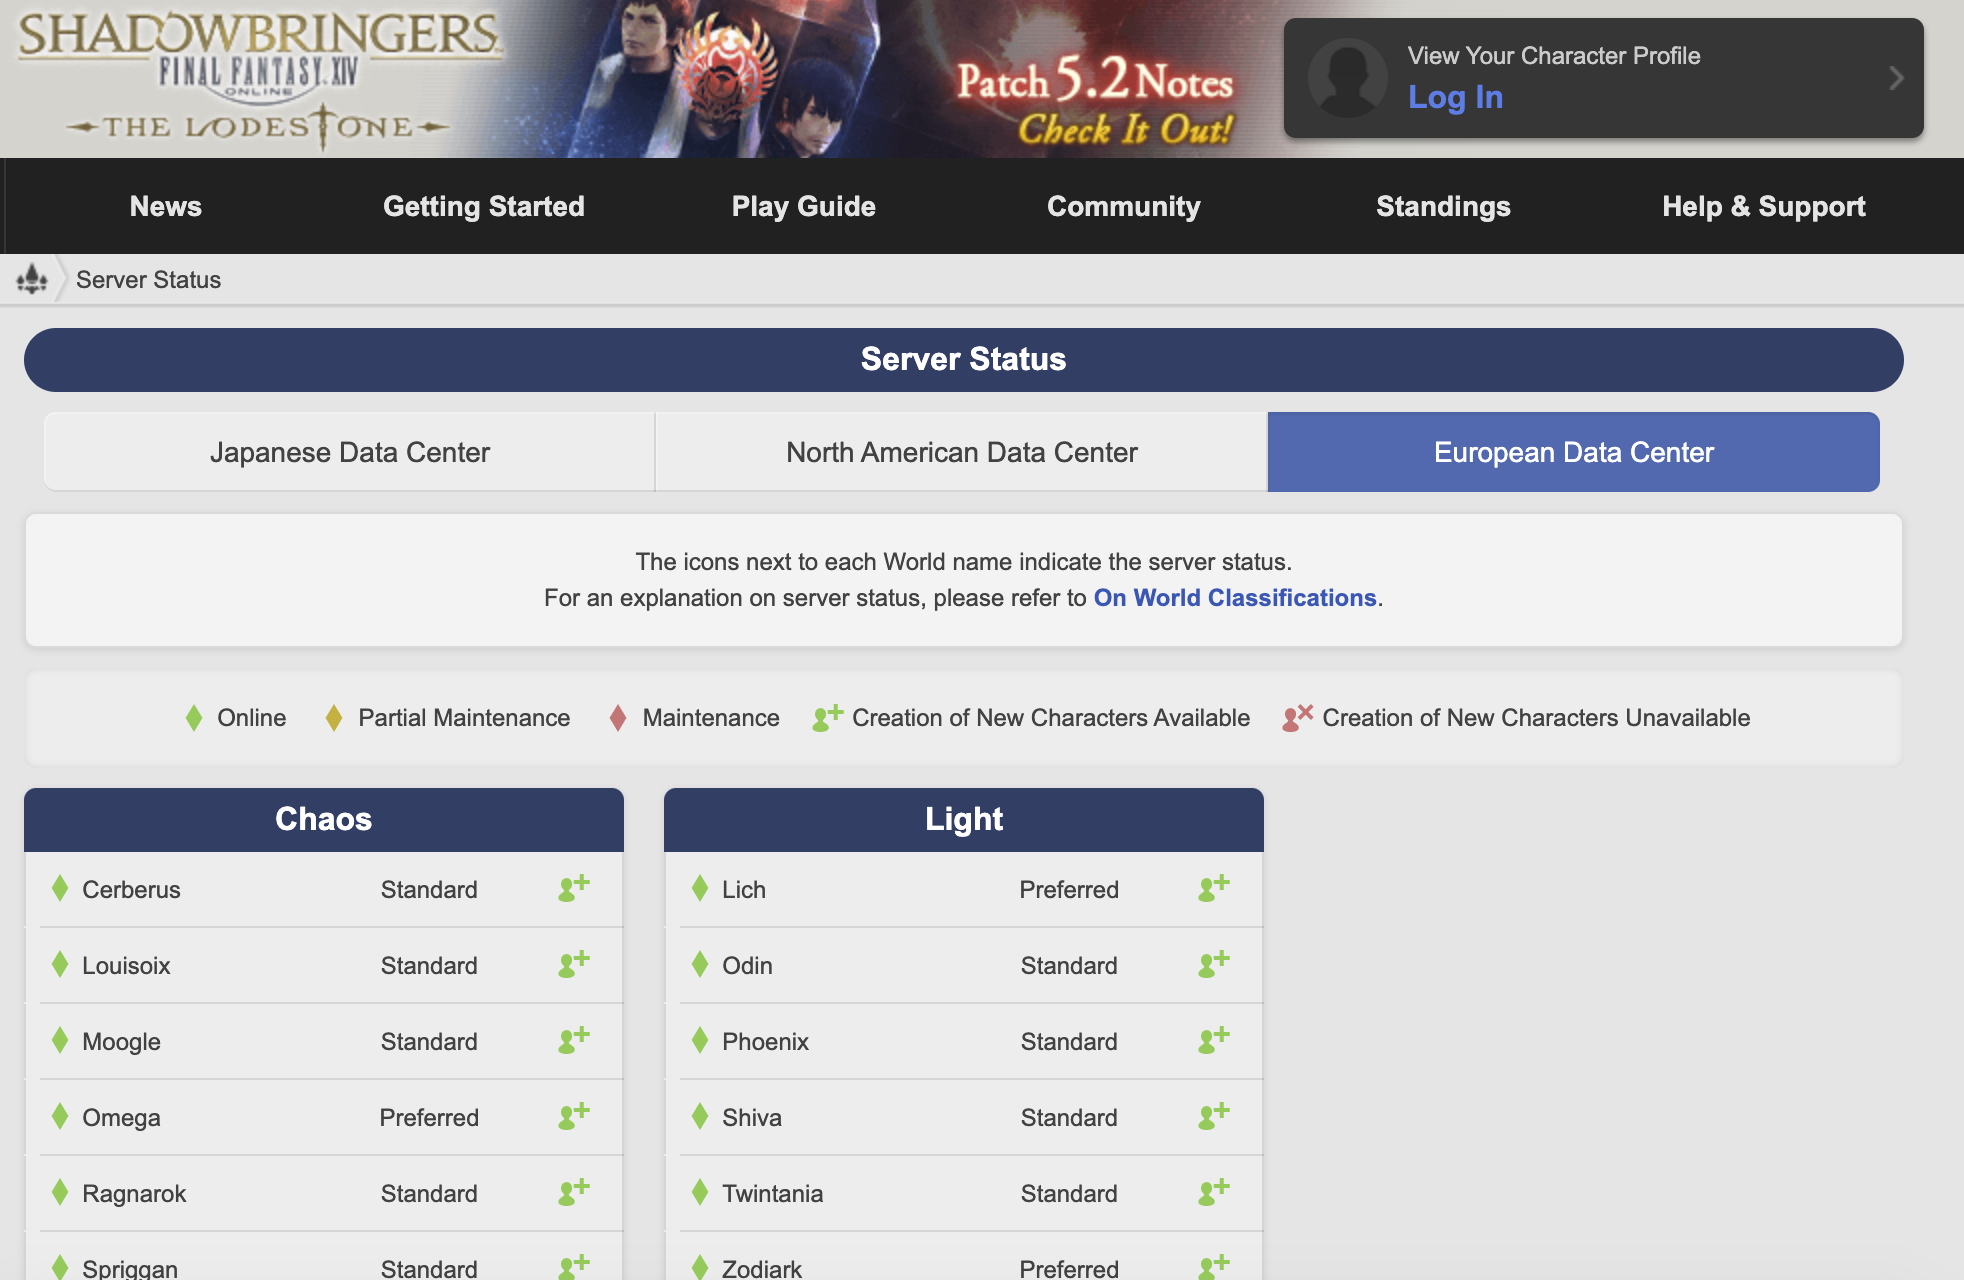 server status page of FFXIV